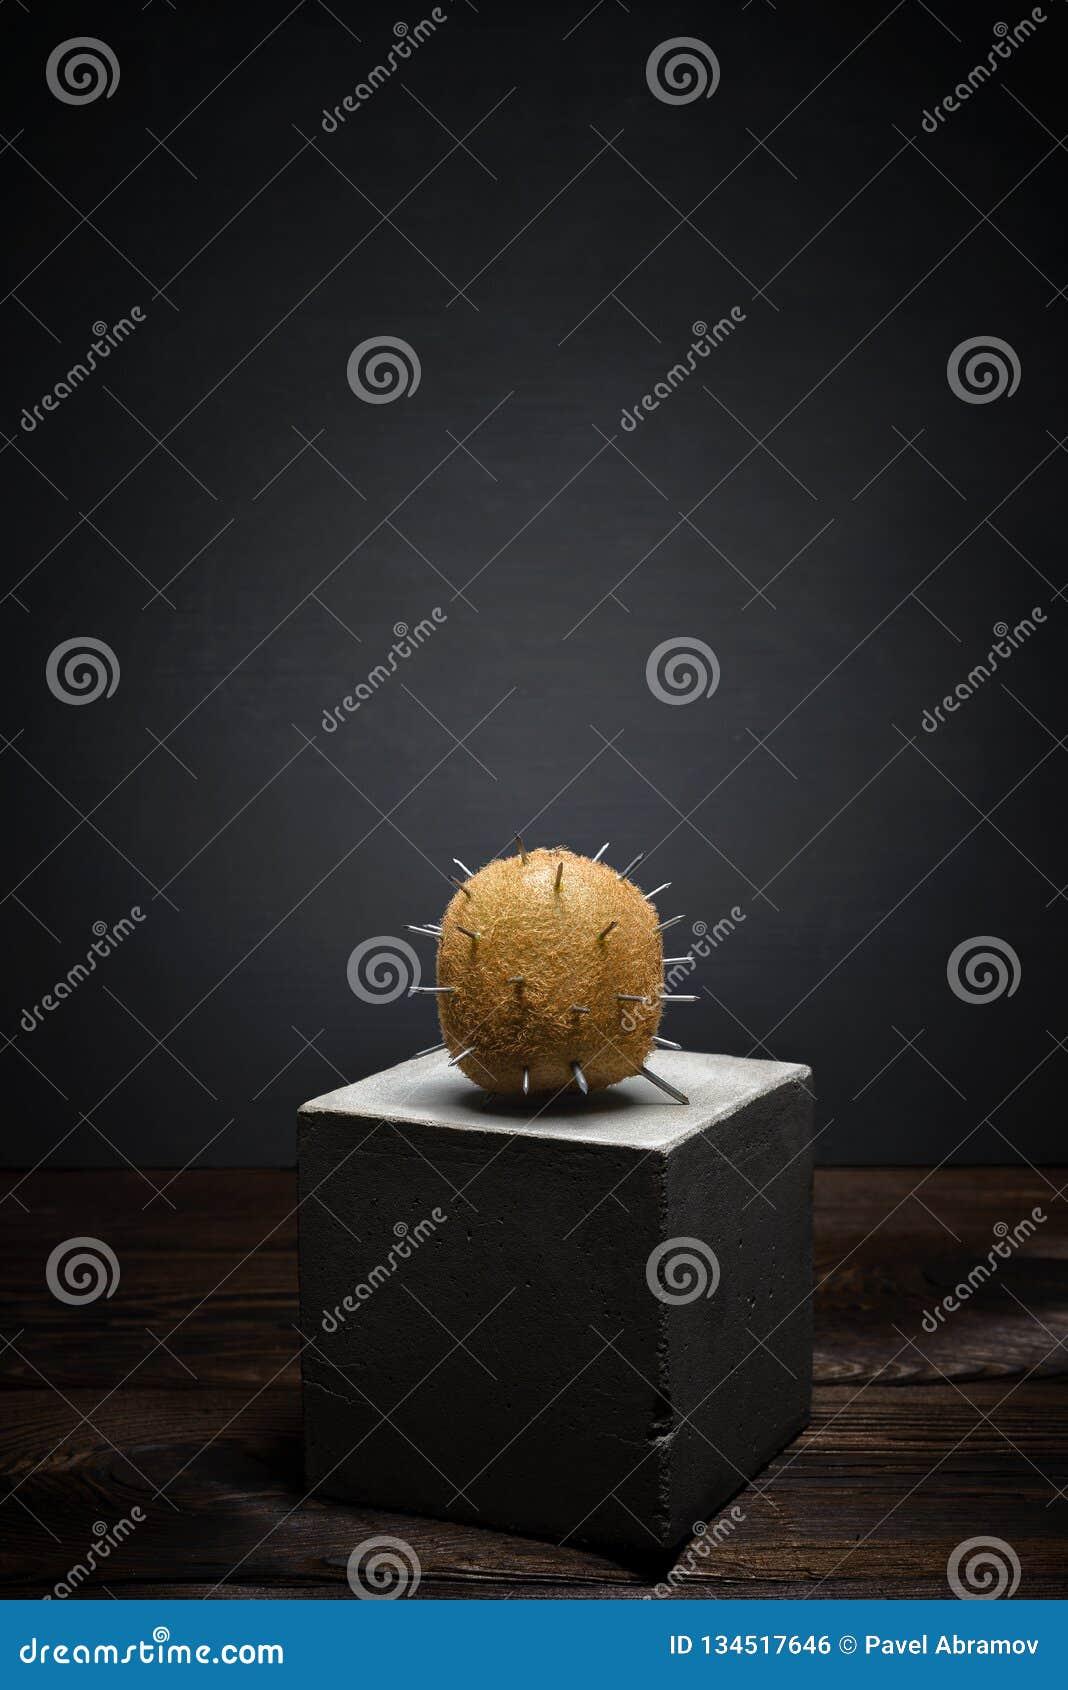 Fresh fruit on dark background on concrete stand. Soft shaggy kiwi fruit with sharp thorns